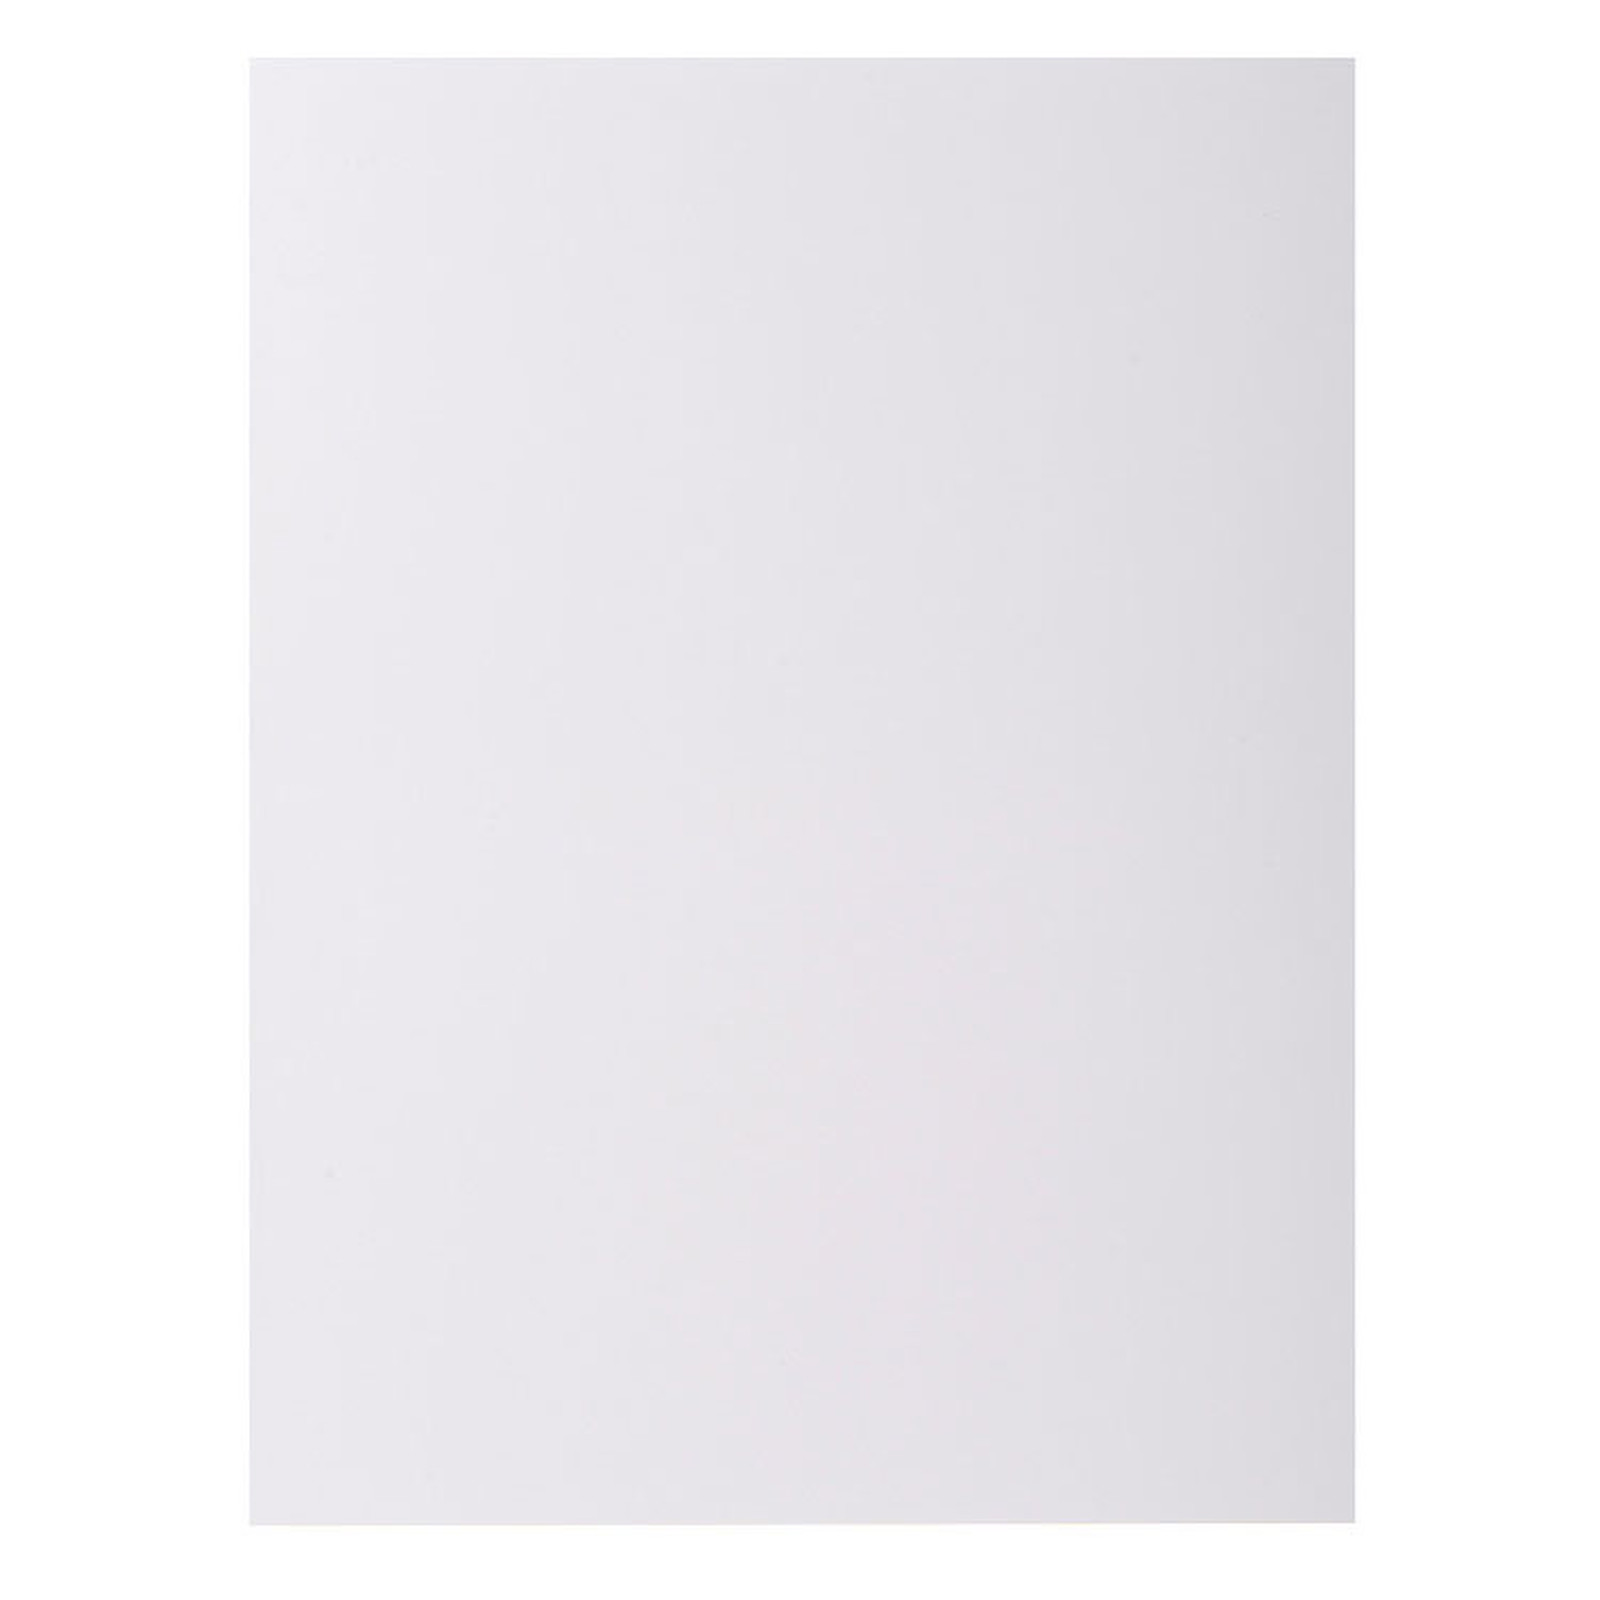 "Exacompta Chemises Rock""s Blanc x 100"